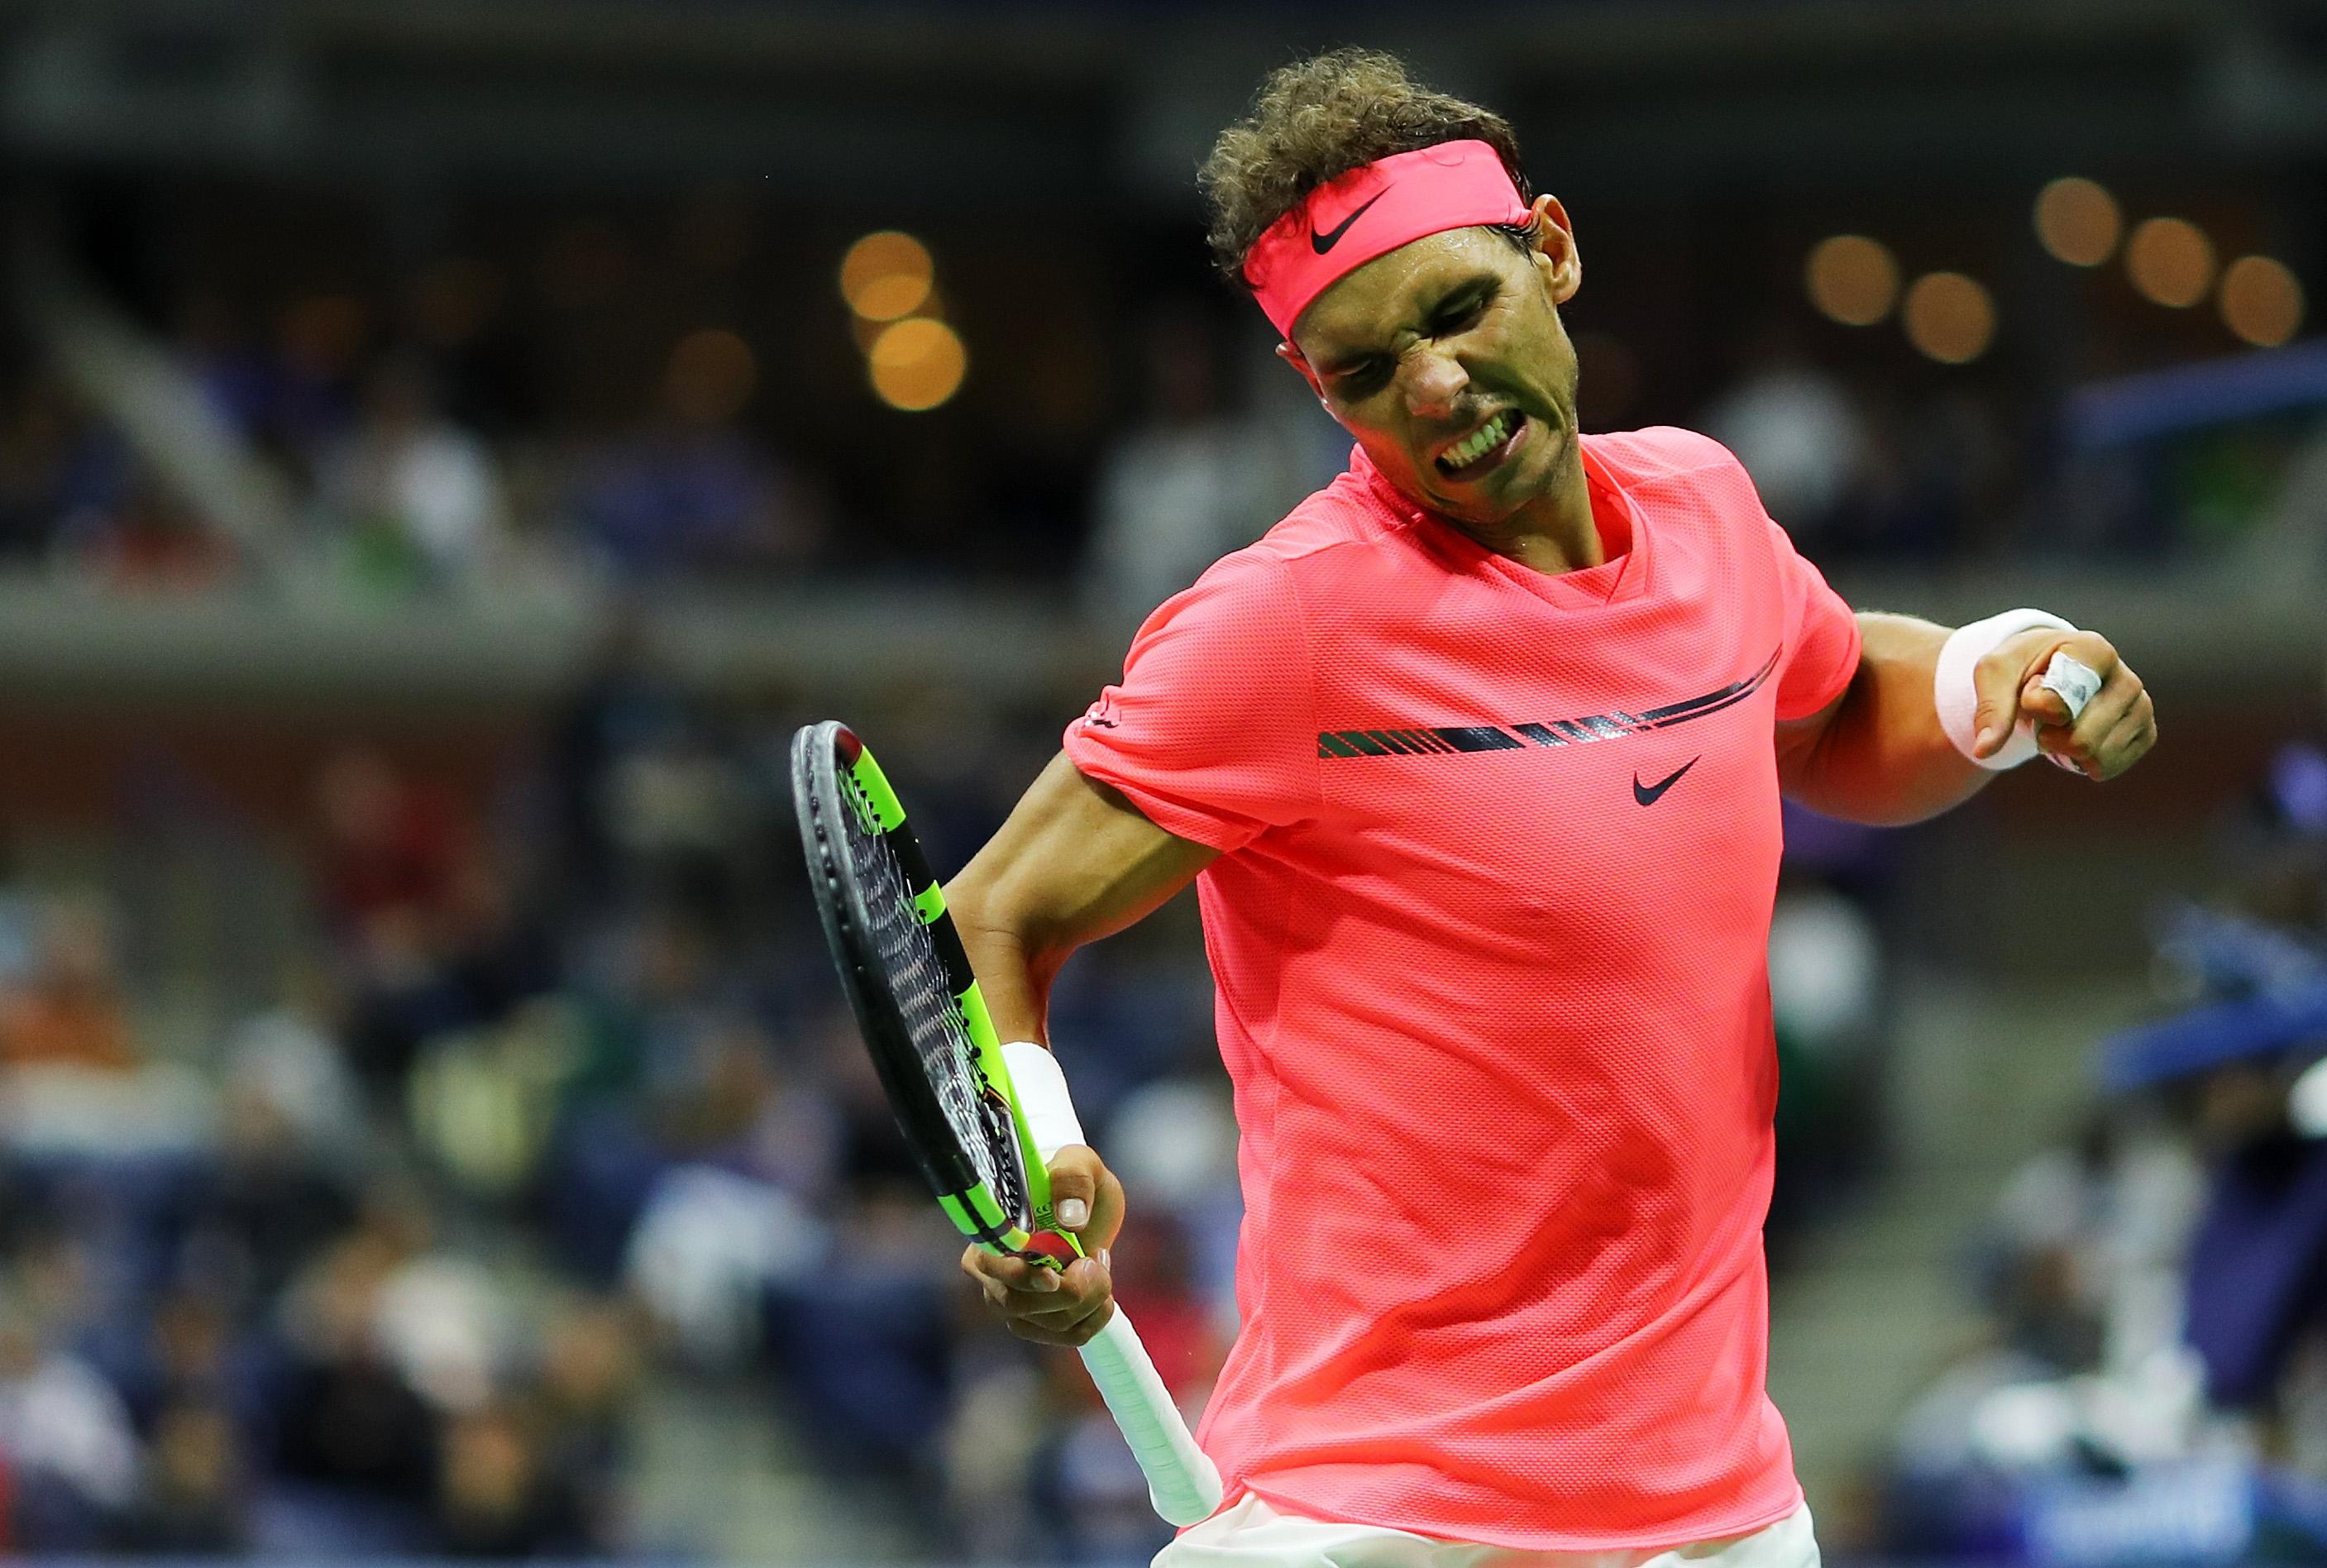 Us Open 2017 Rafael Nadal Makes Triumphant Return To Quarterfinals